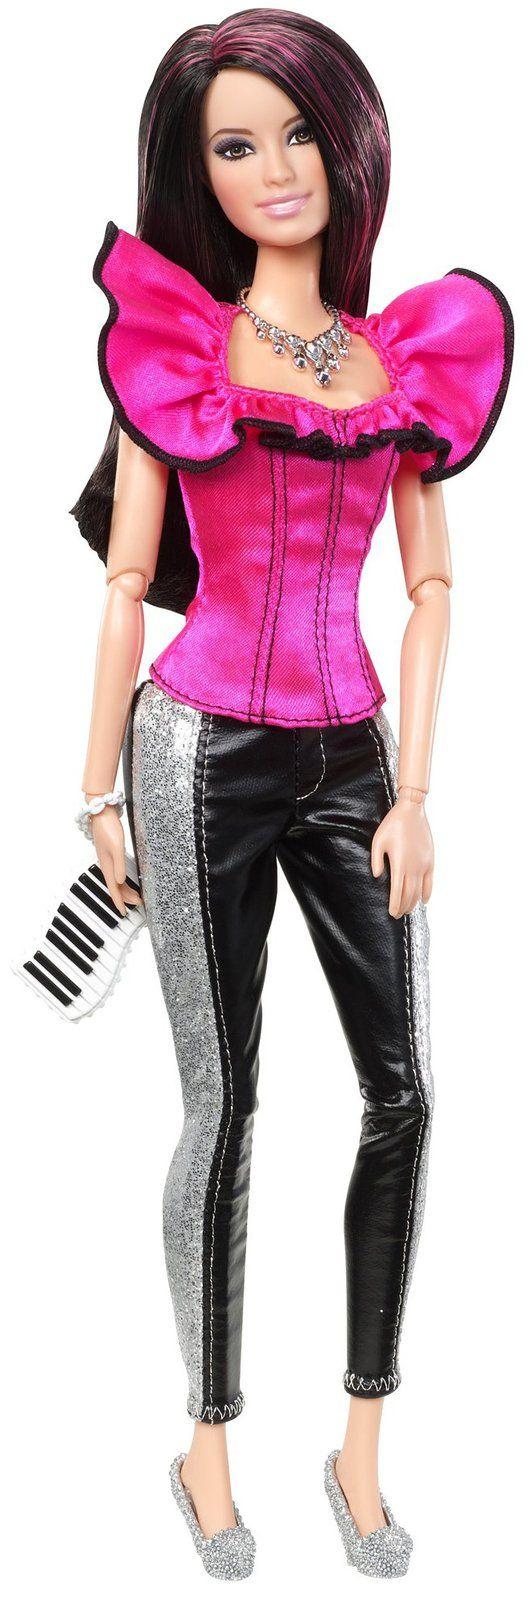 Mattel Barbie Fashionistas Doll - Raquelle - Free Shipping